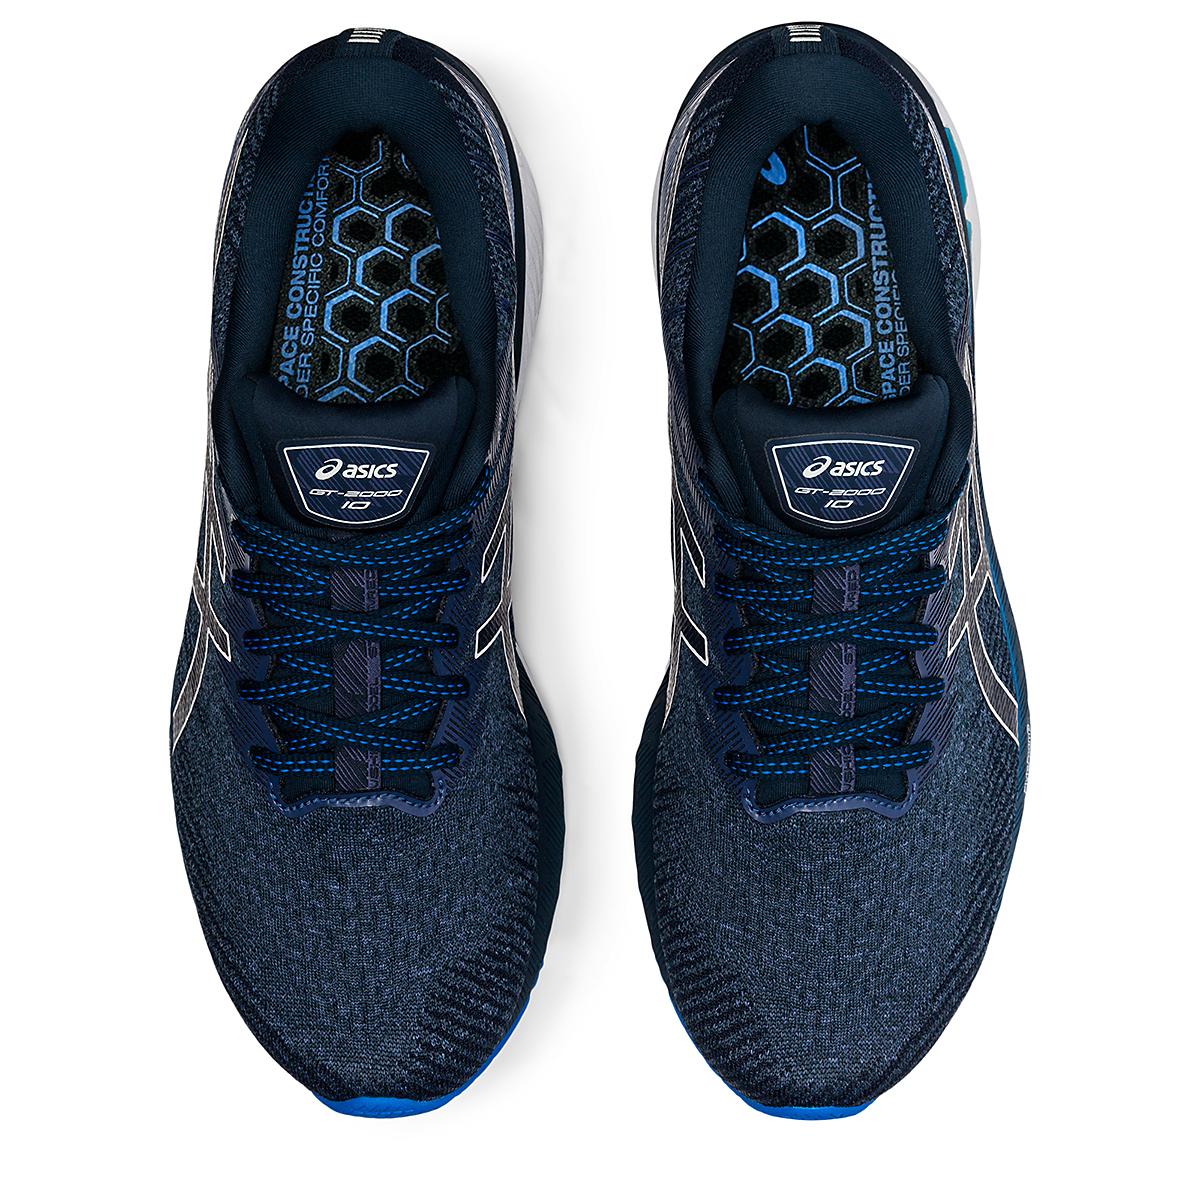 Men's Asics GT-2000 10 Running Shoe - Color: Thunder Blue/French Blue - Size: 7 - Width: Regular, Thunder Blue/French Blue, large, image 6